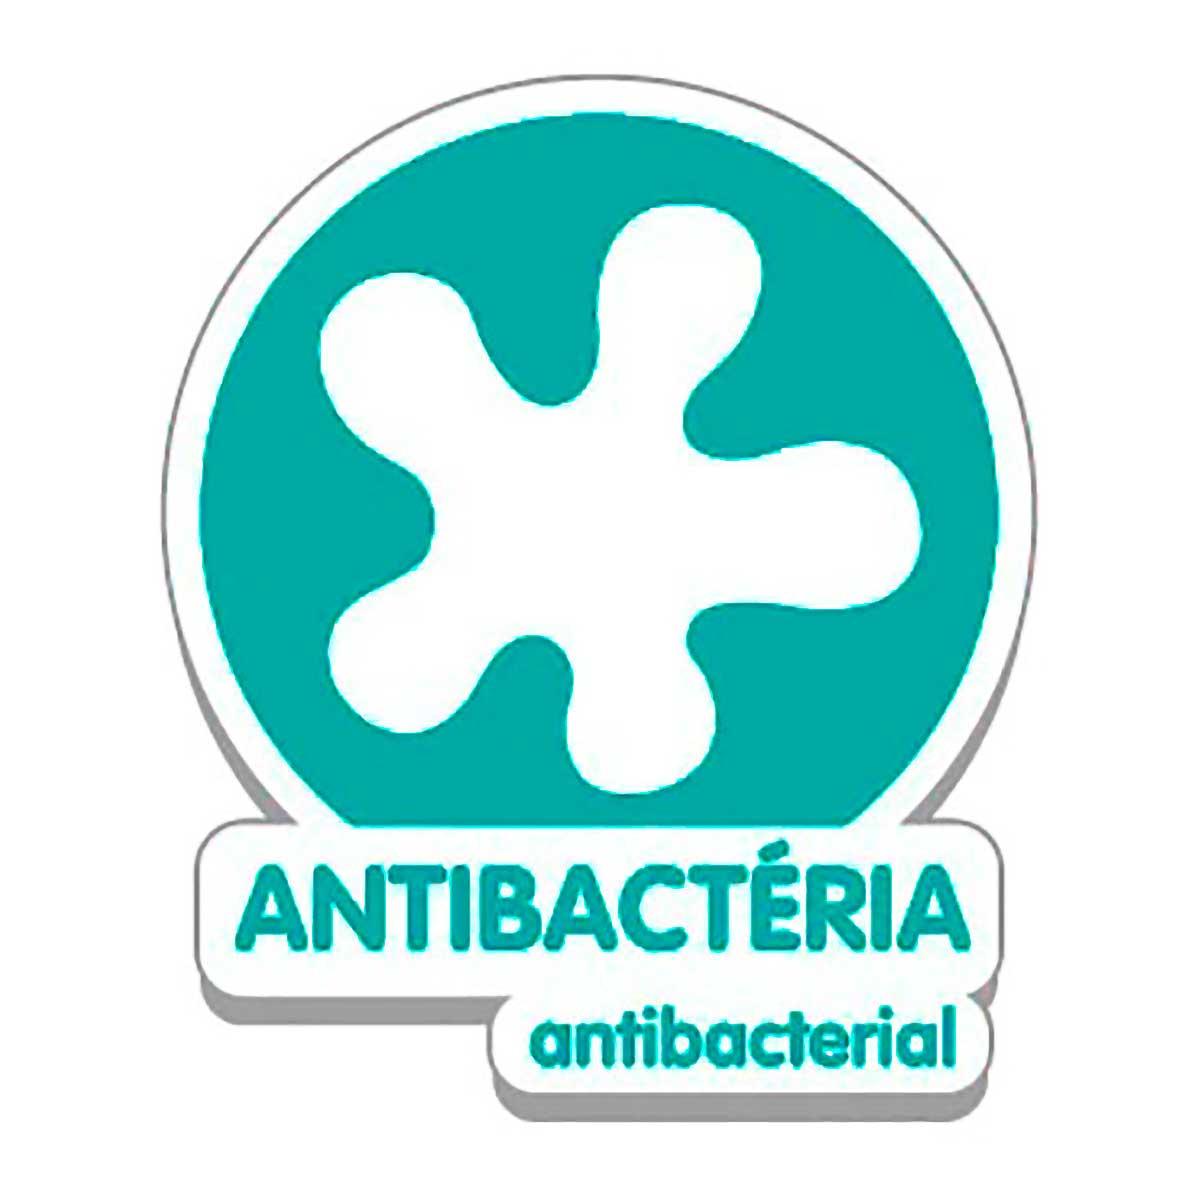 Conjunto de Potes Retangular Antibactéria 6 pç